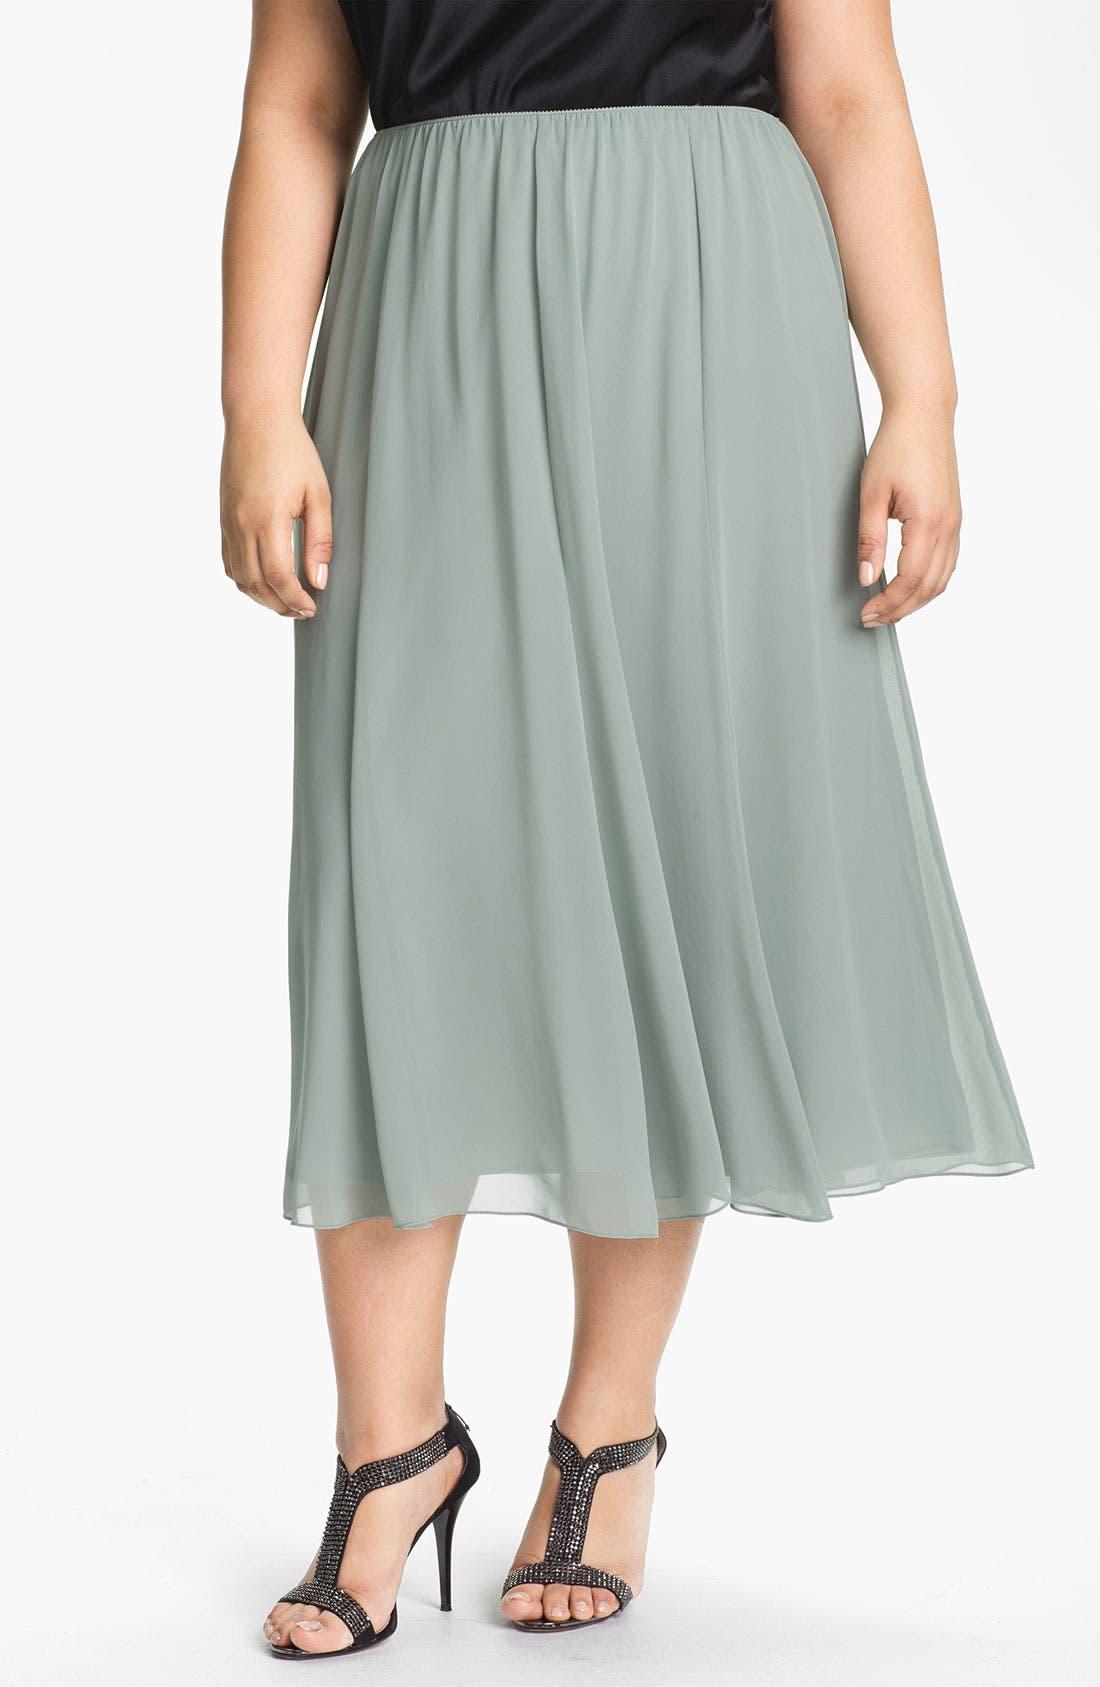 Alternate Image 1 Selected - Alex Evenings Chiffon Skirt (Plus Size)